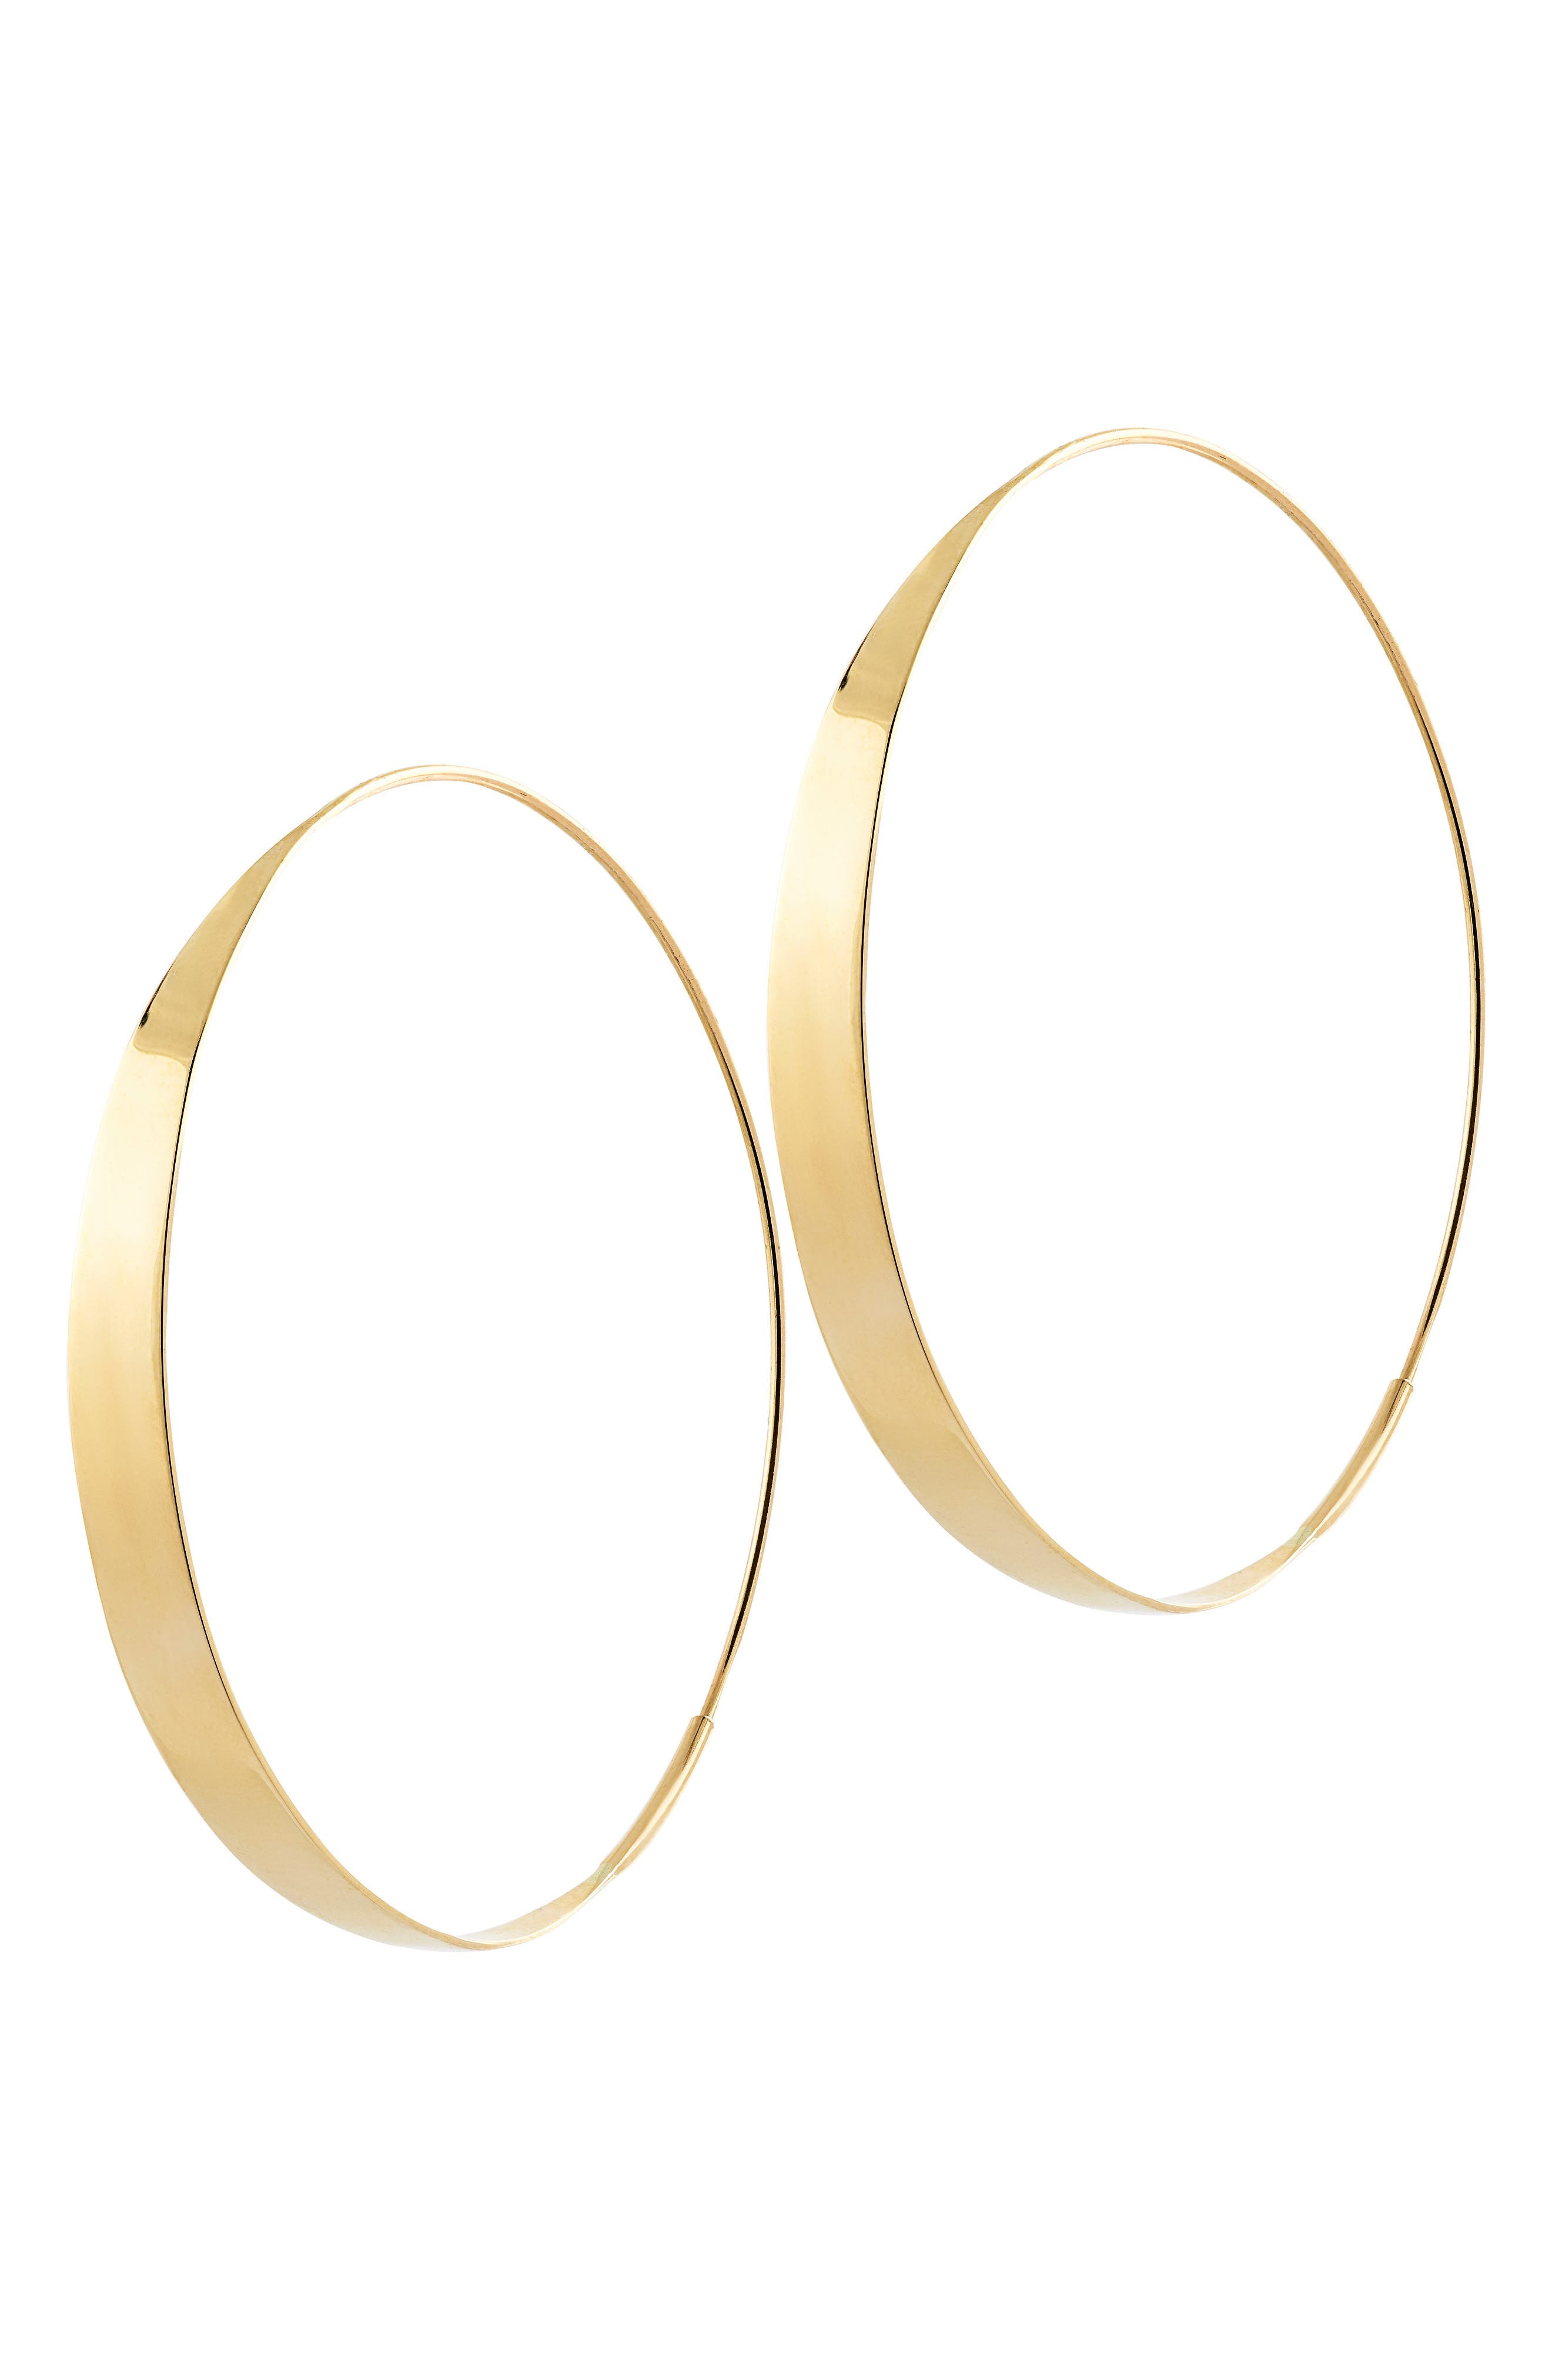 Bond Endless Hoop Earrings,                         Main,                         color, YELLOW GOLD